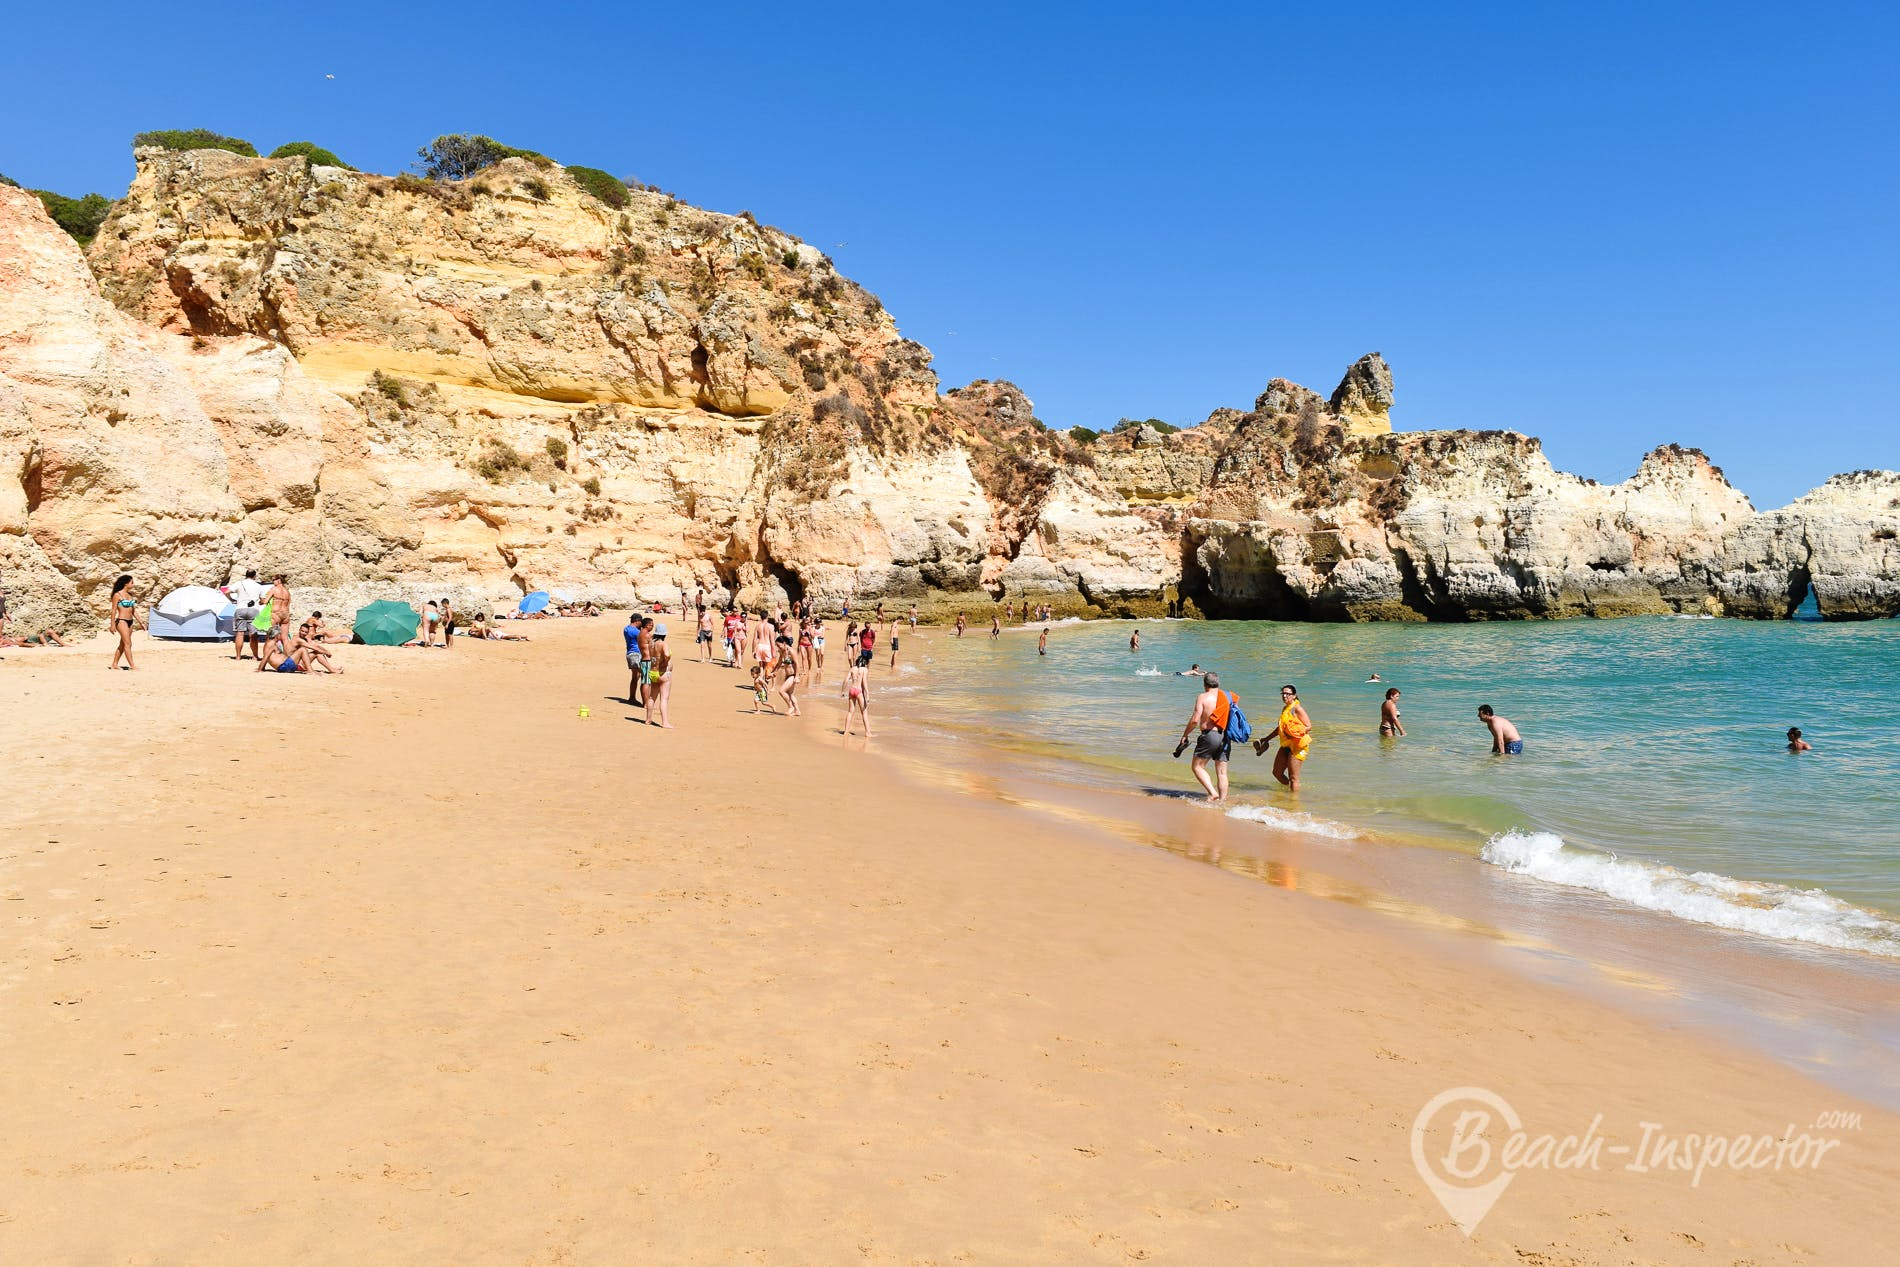 Strand Praia dos Três Irmãos, Algarve, Portugal